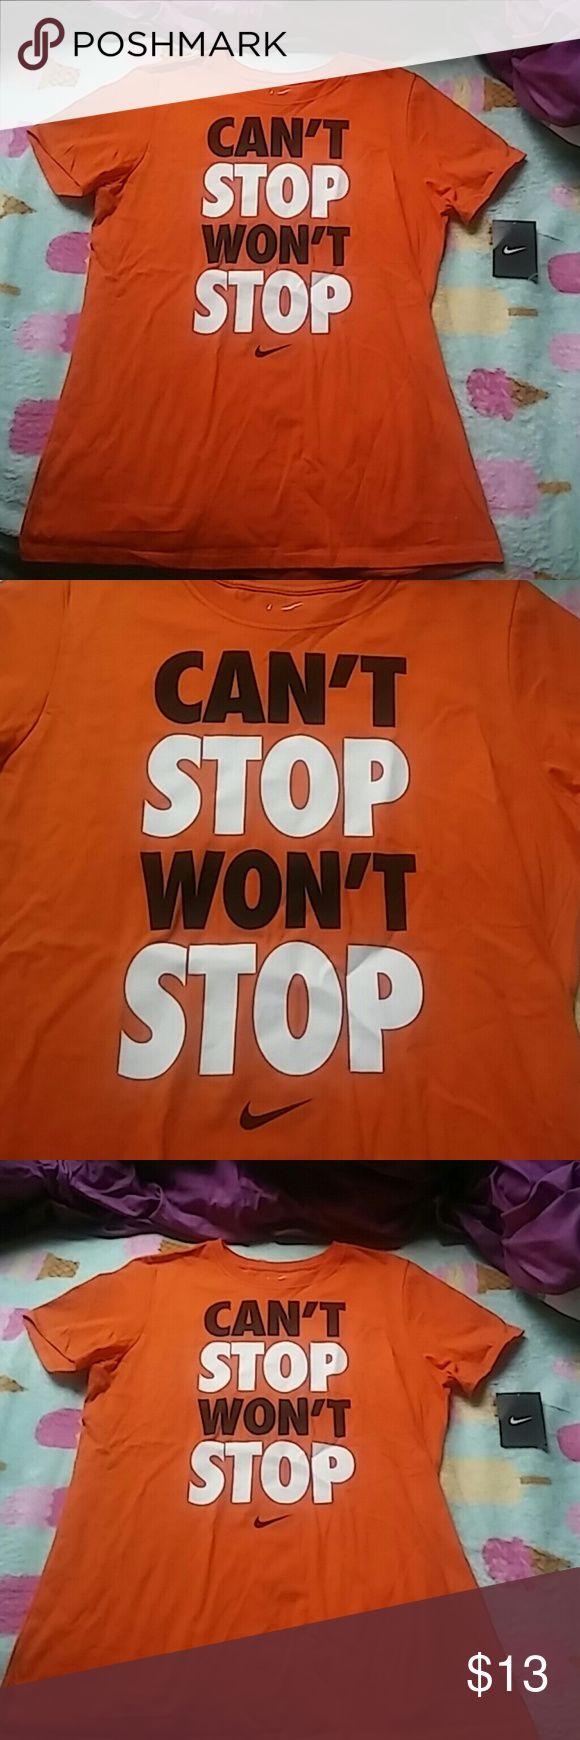 Nwt Nike orange shirt This is a new women's Nike orange can't stop won't stop shirt in a size large Nike Tops